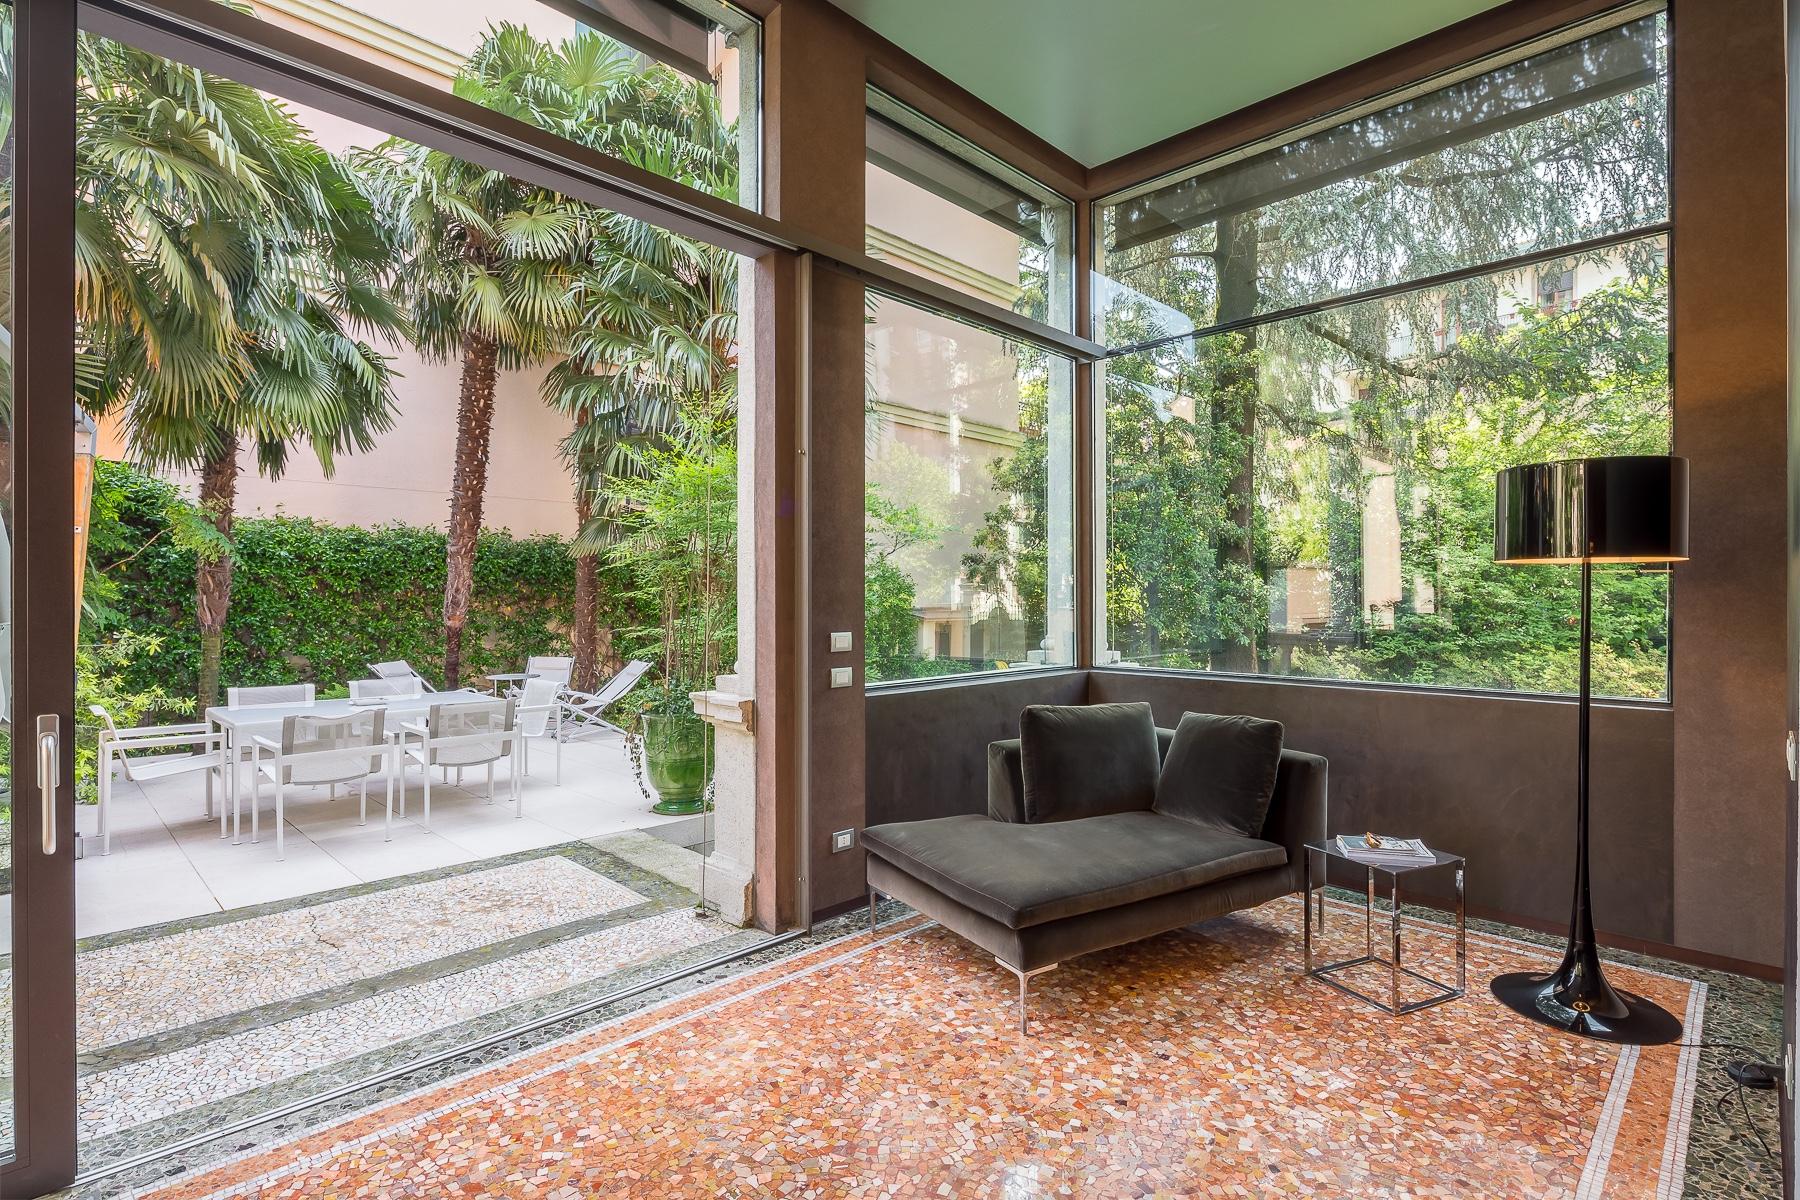 Villa in Vendita a Varese: 5 locali, 800 mq - Foto 6